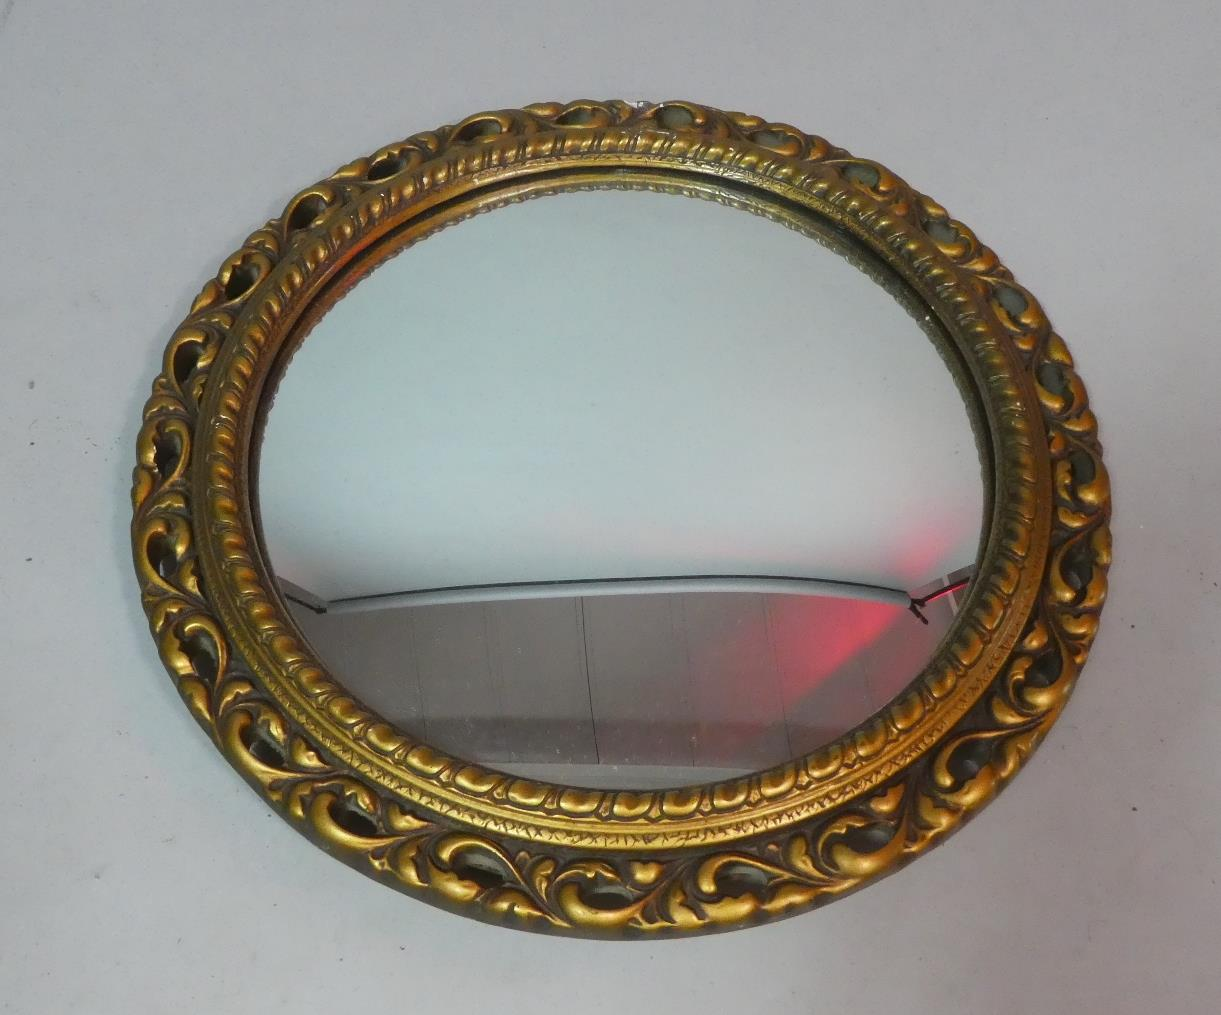 Lot 449 - Circular Pierced Gilt Frame Wall Mirror, 45cm Diameter